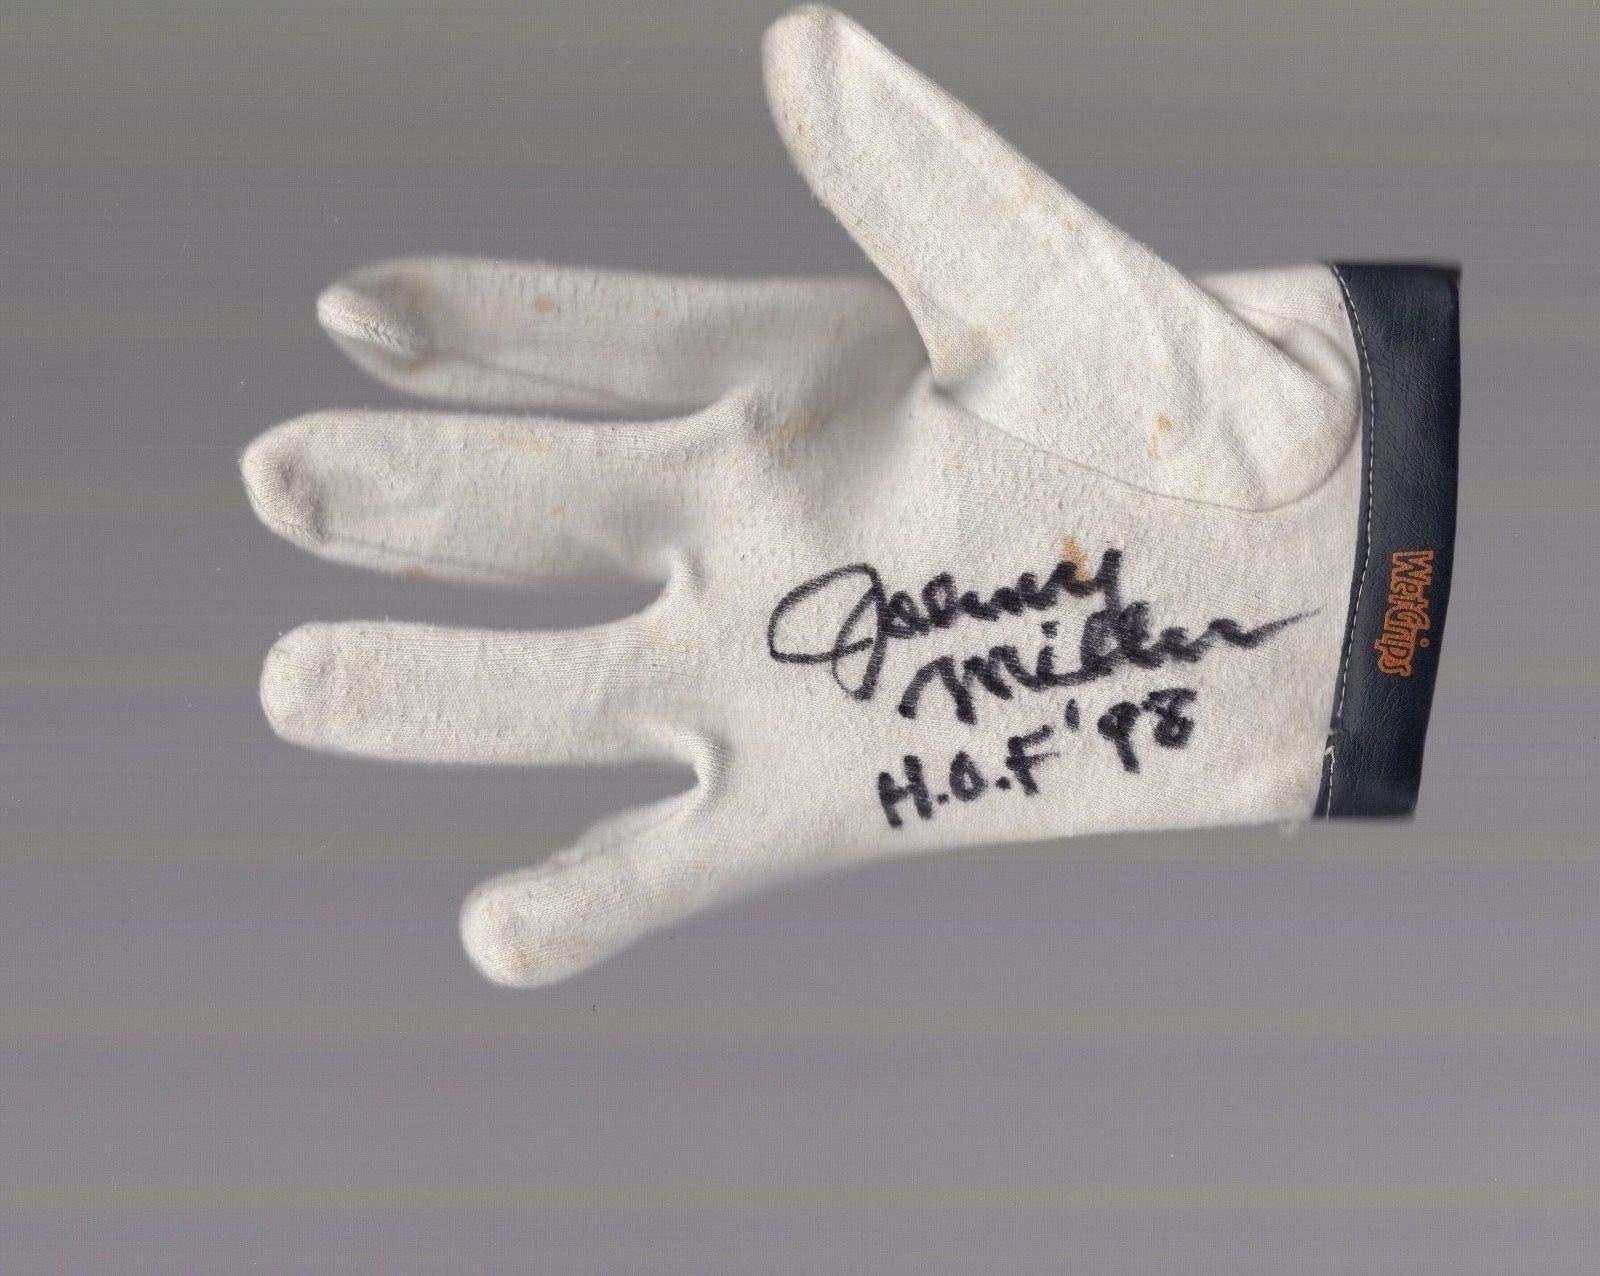 Johnny Miller Hand Signed And Used Golf Glove Hof Inscription JSA Certified Autographed Golf Gloves